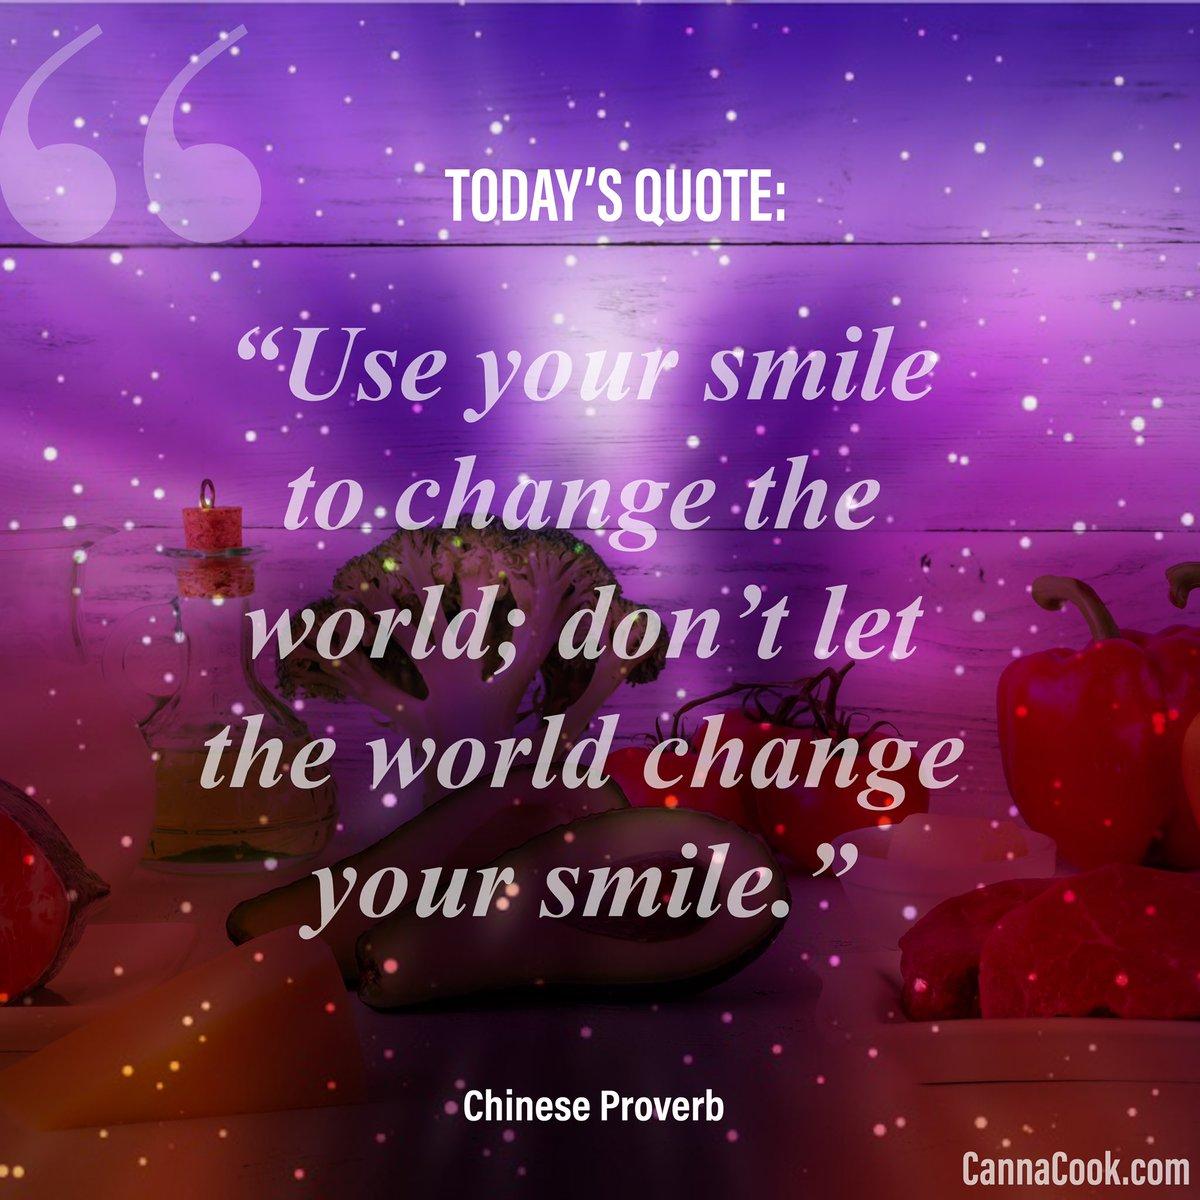 Quote of the day #MotivationMonday #MotivationalQuotes #Motivation #inspiration #inspire #quotestodaypic.twitter.com/MOGw9SM6Ny